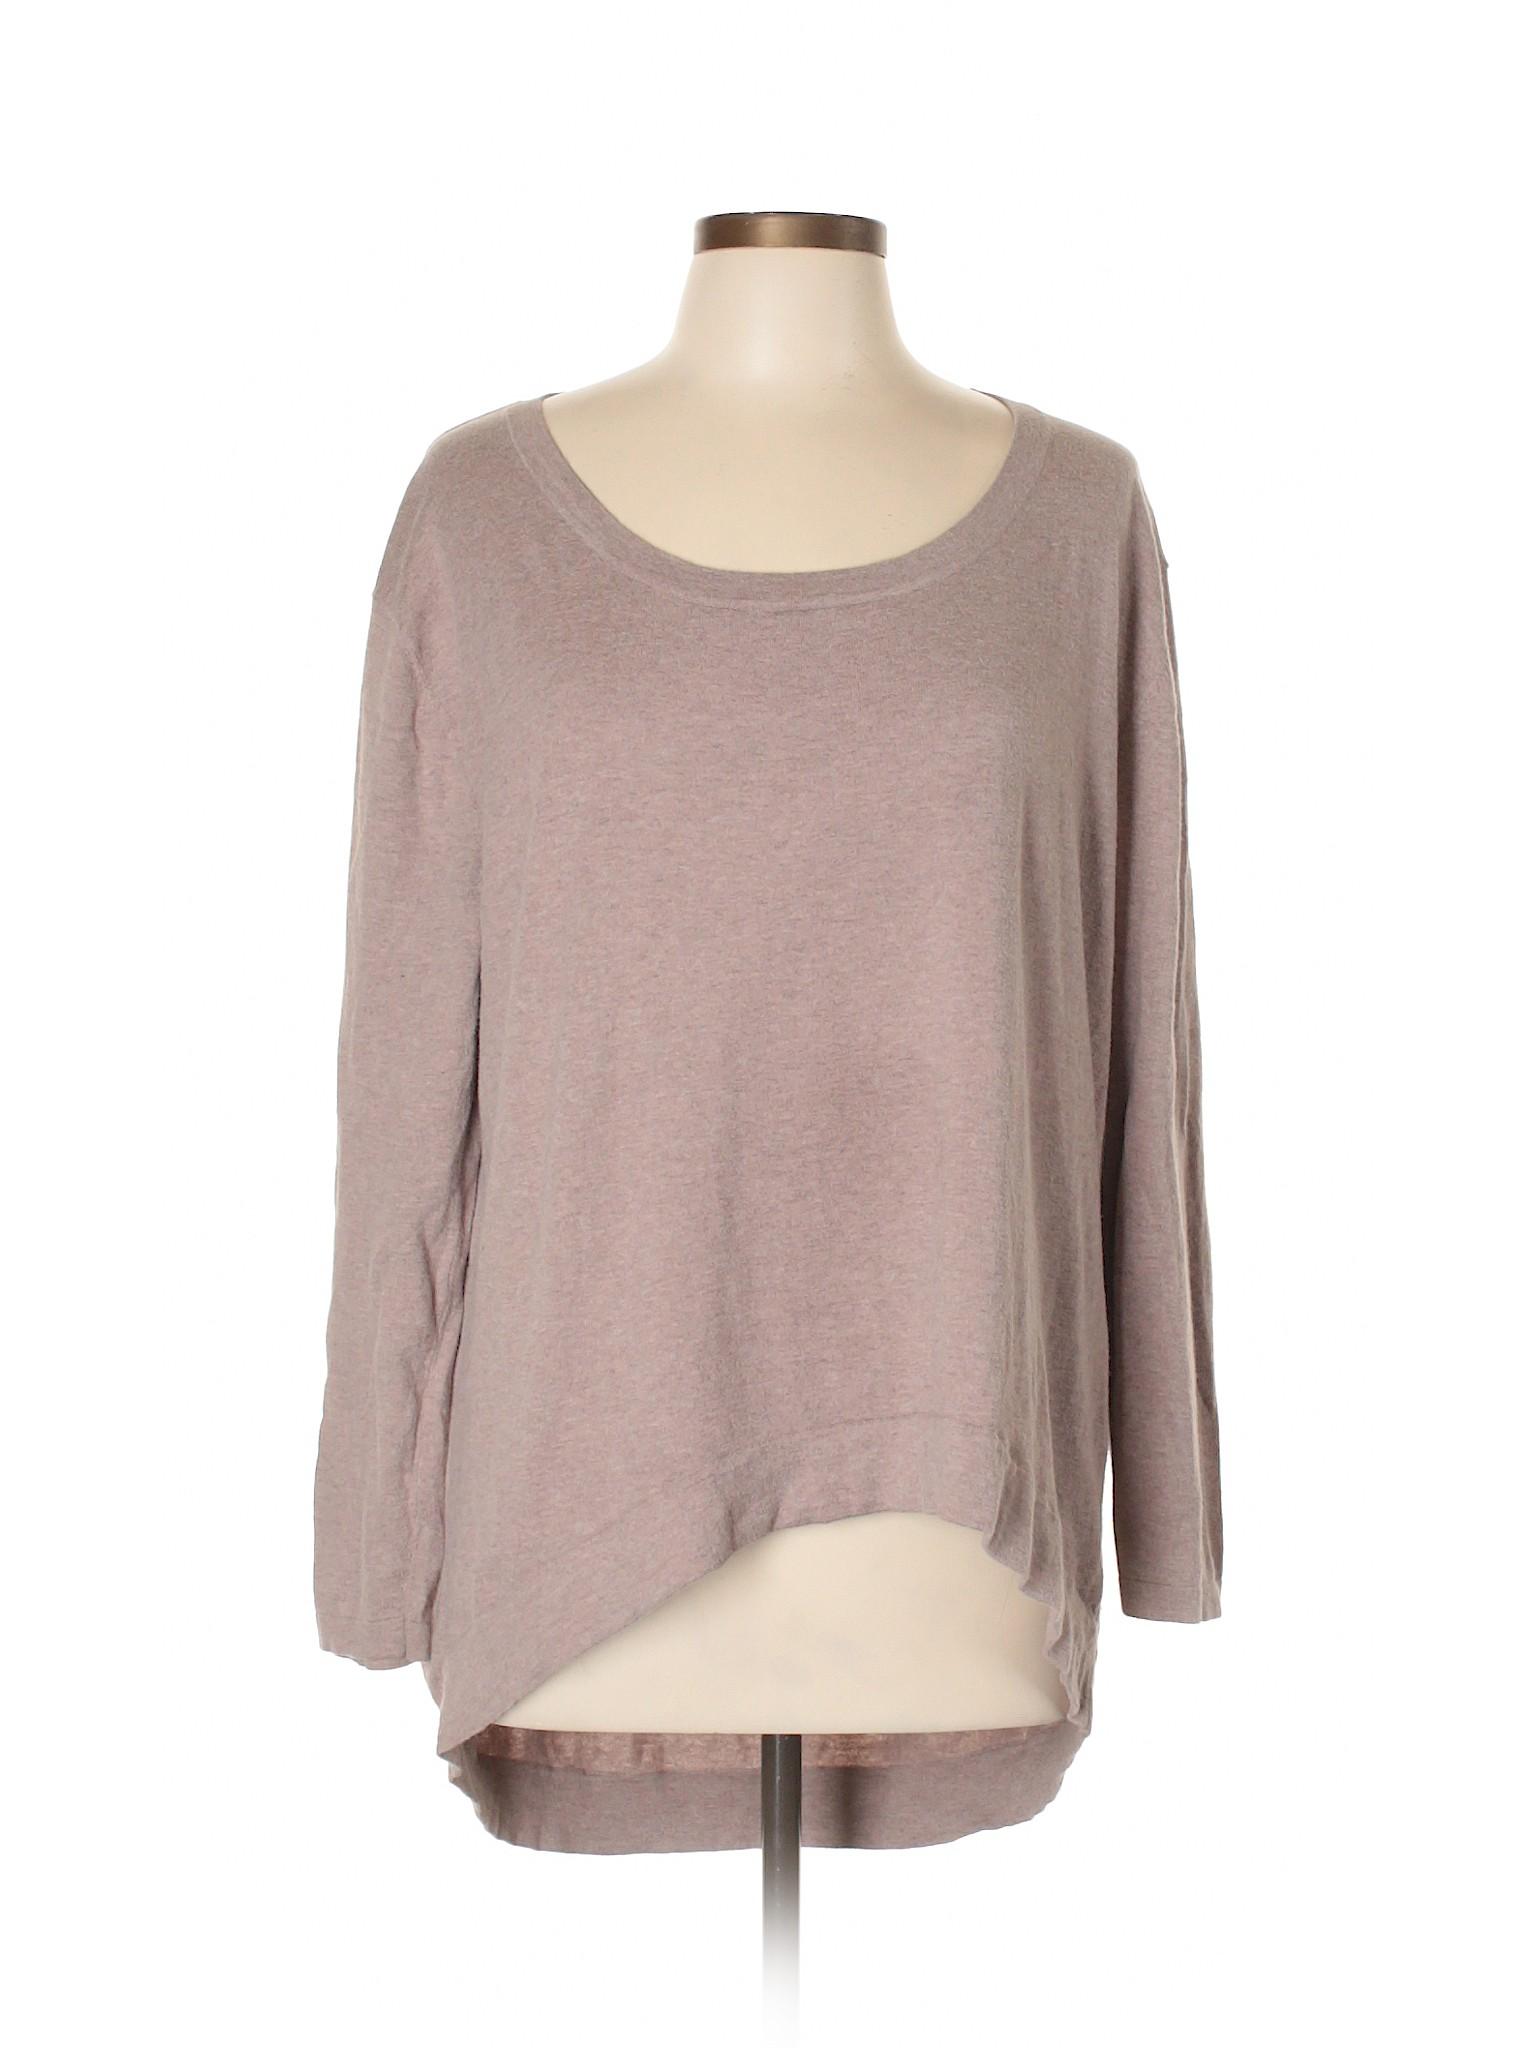 winter Pullover Pullover Boutique Boutique Sweater Sweater winter Boutique Baukjen Pullover Baukjen Sweater Baukjen winter wUq6FF8